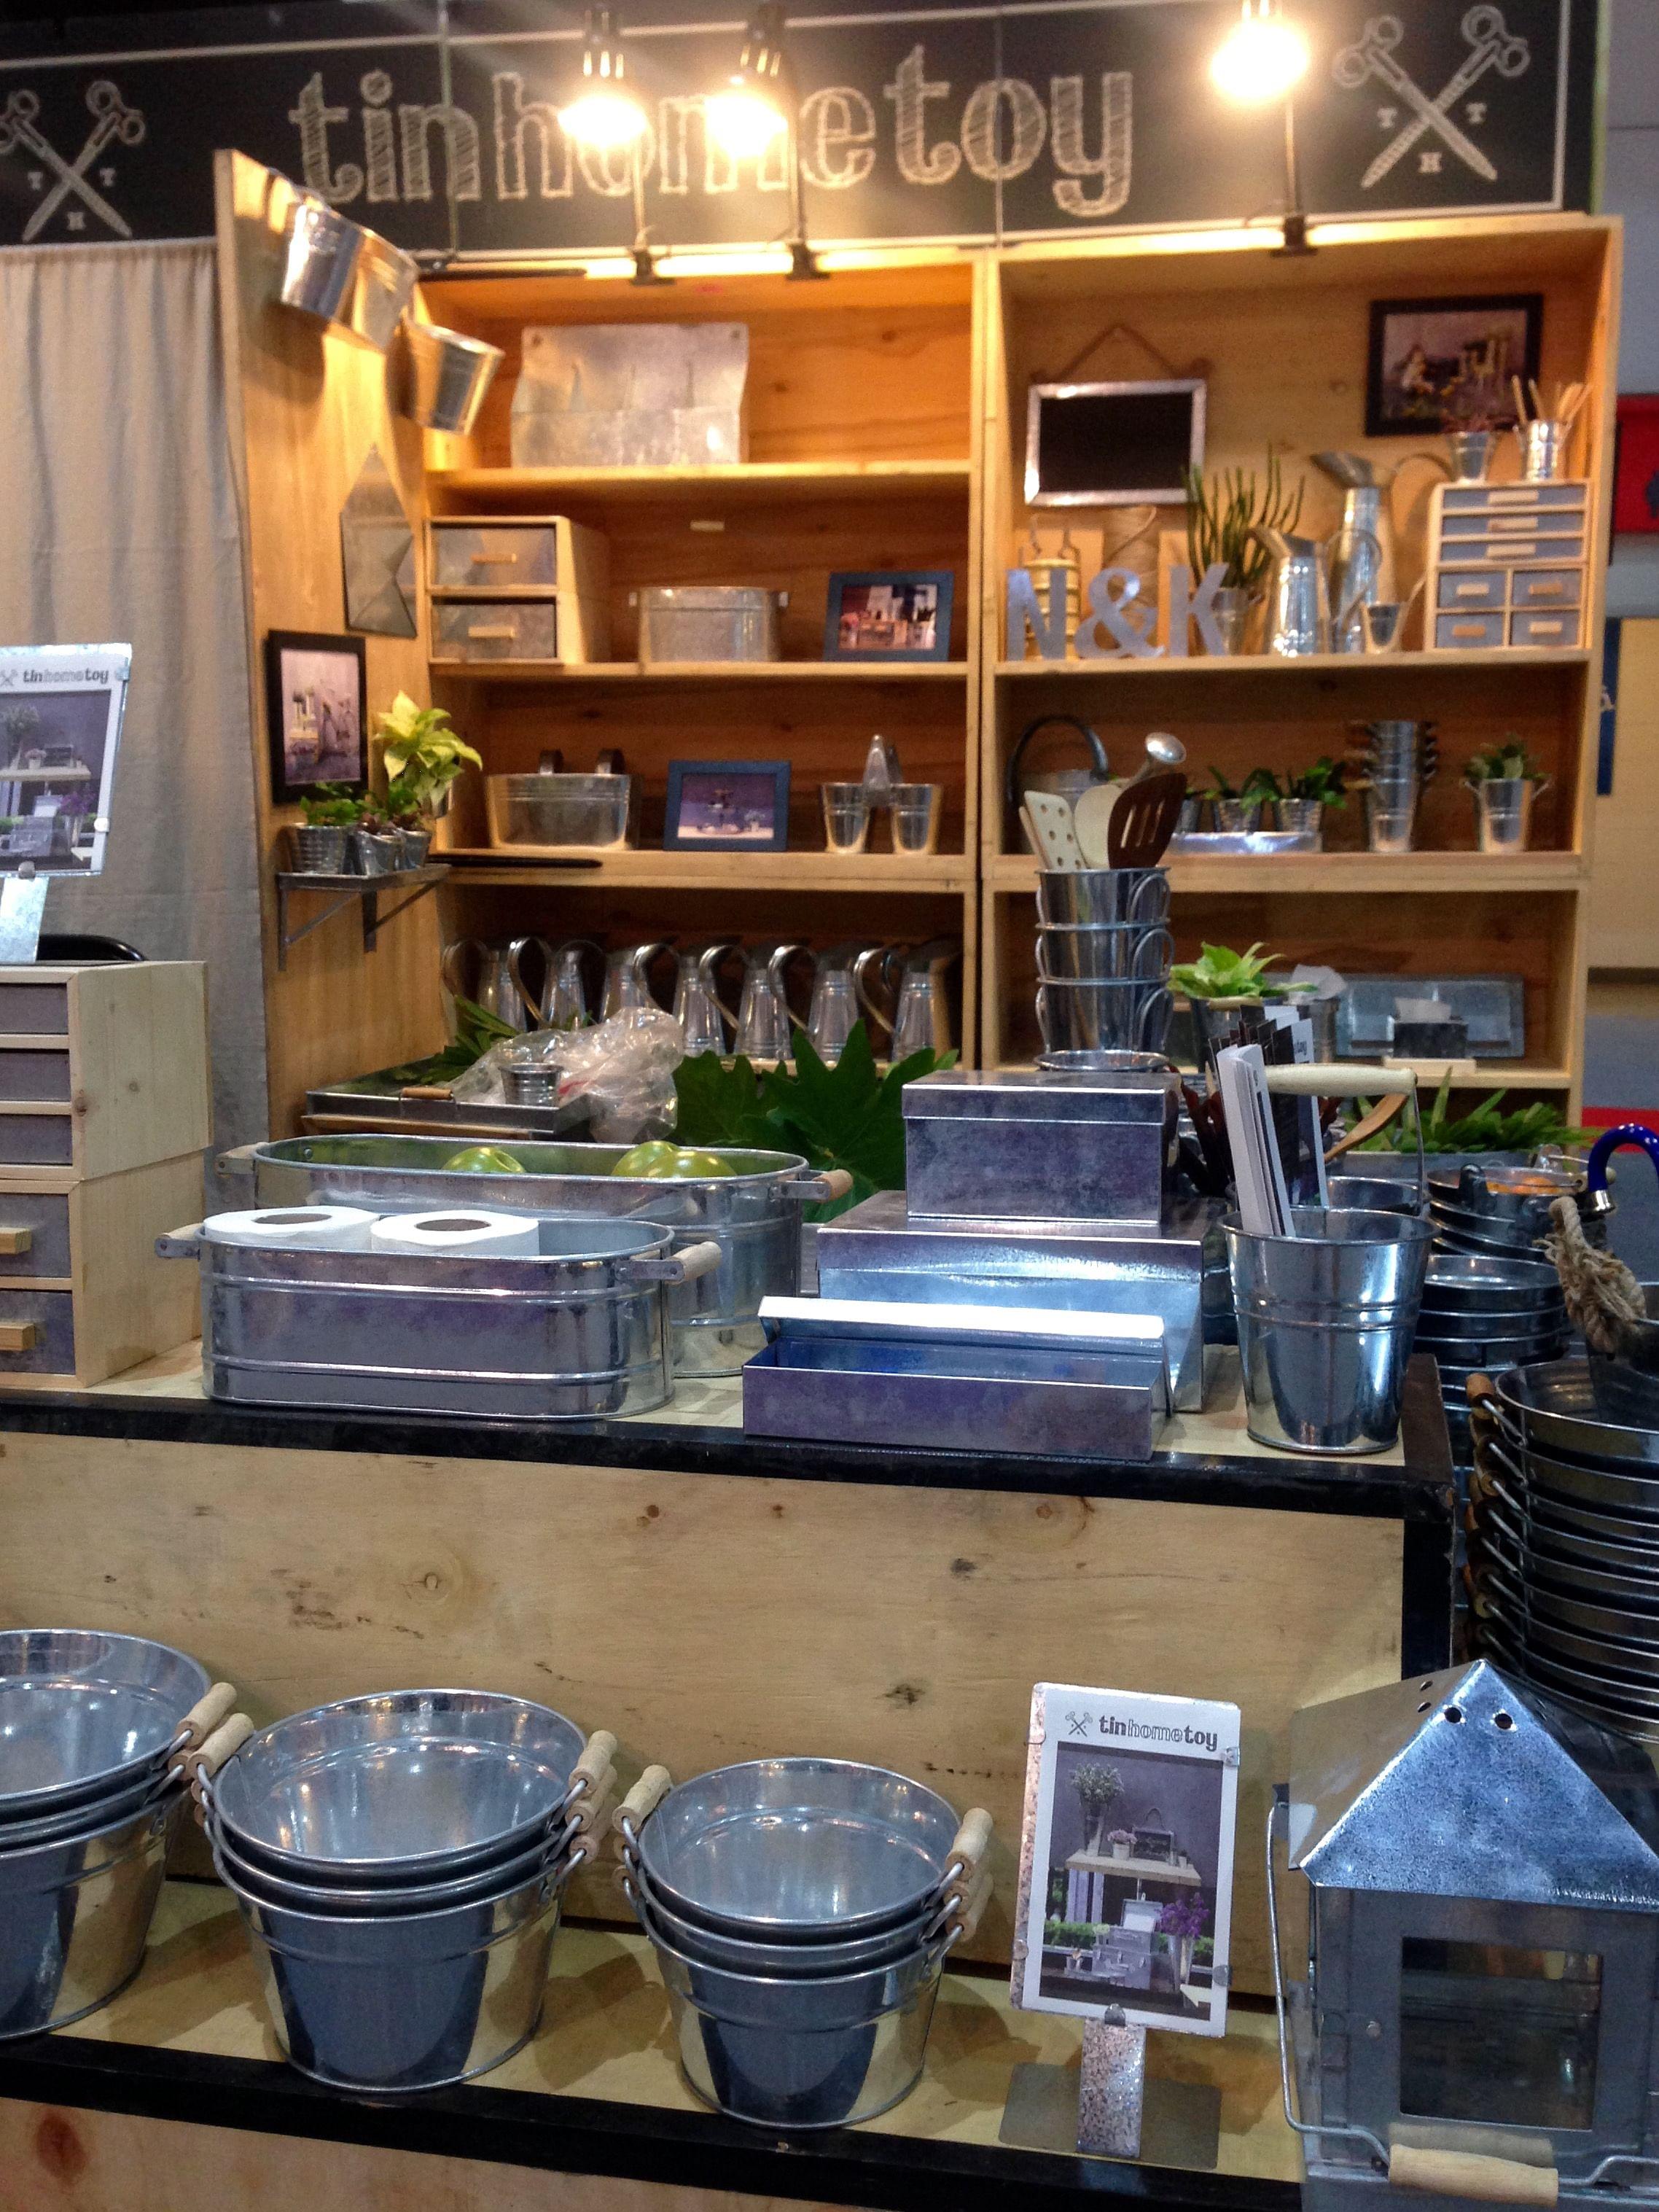 Big Bih Fair Thai Home Accessories Made From Natural